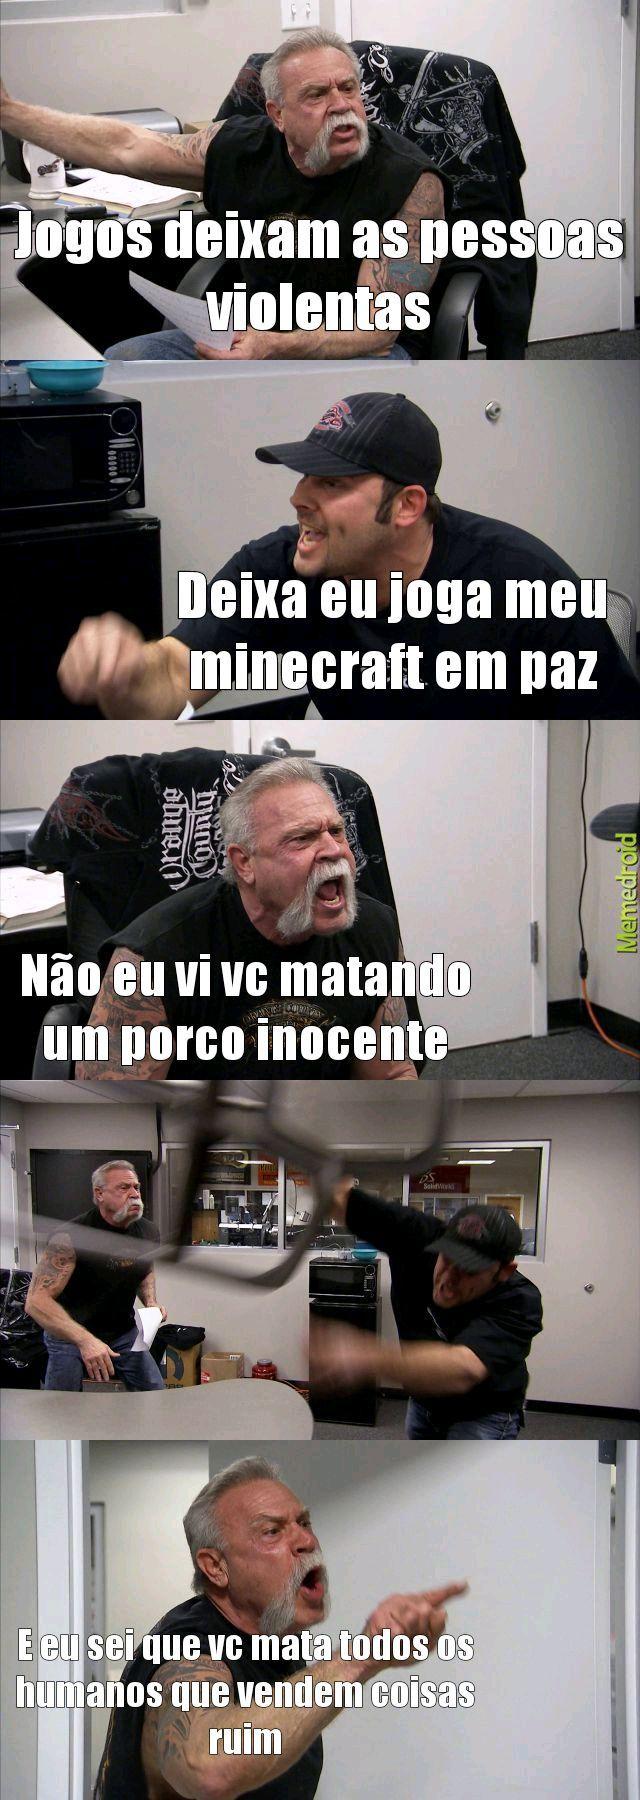 Scoll pre pago - meme